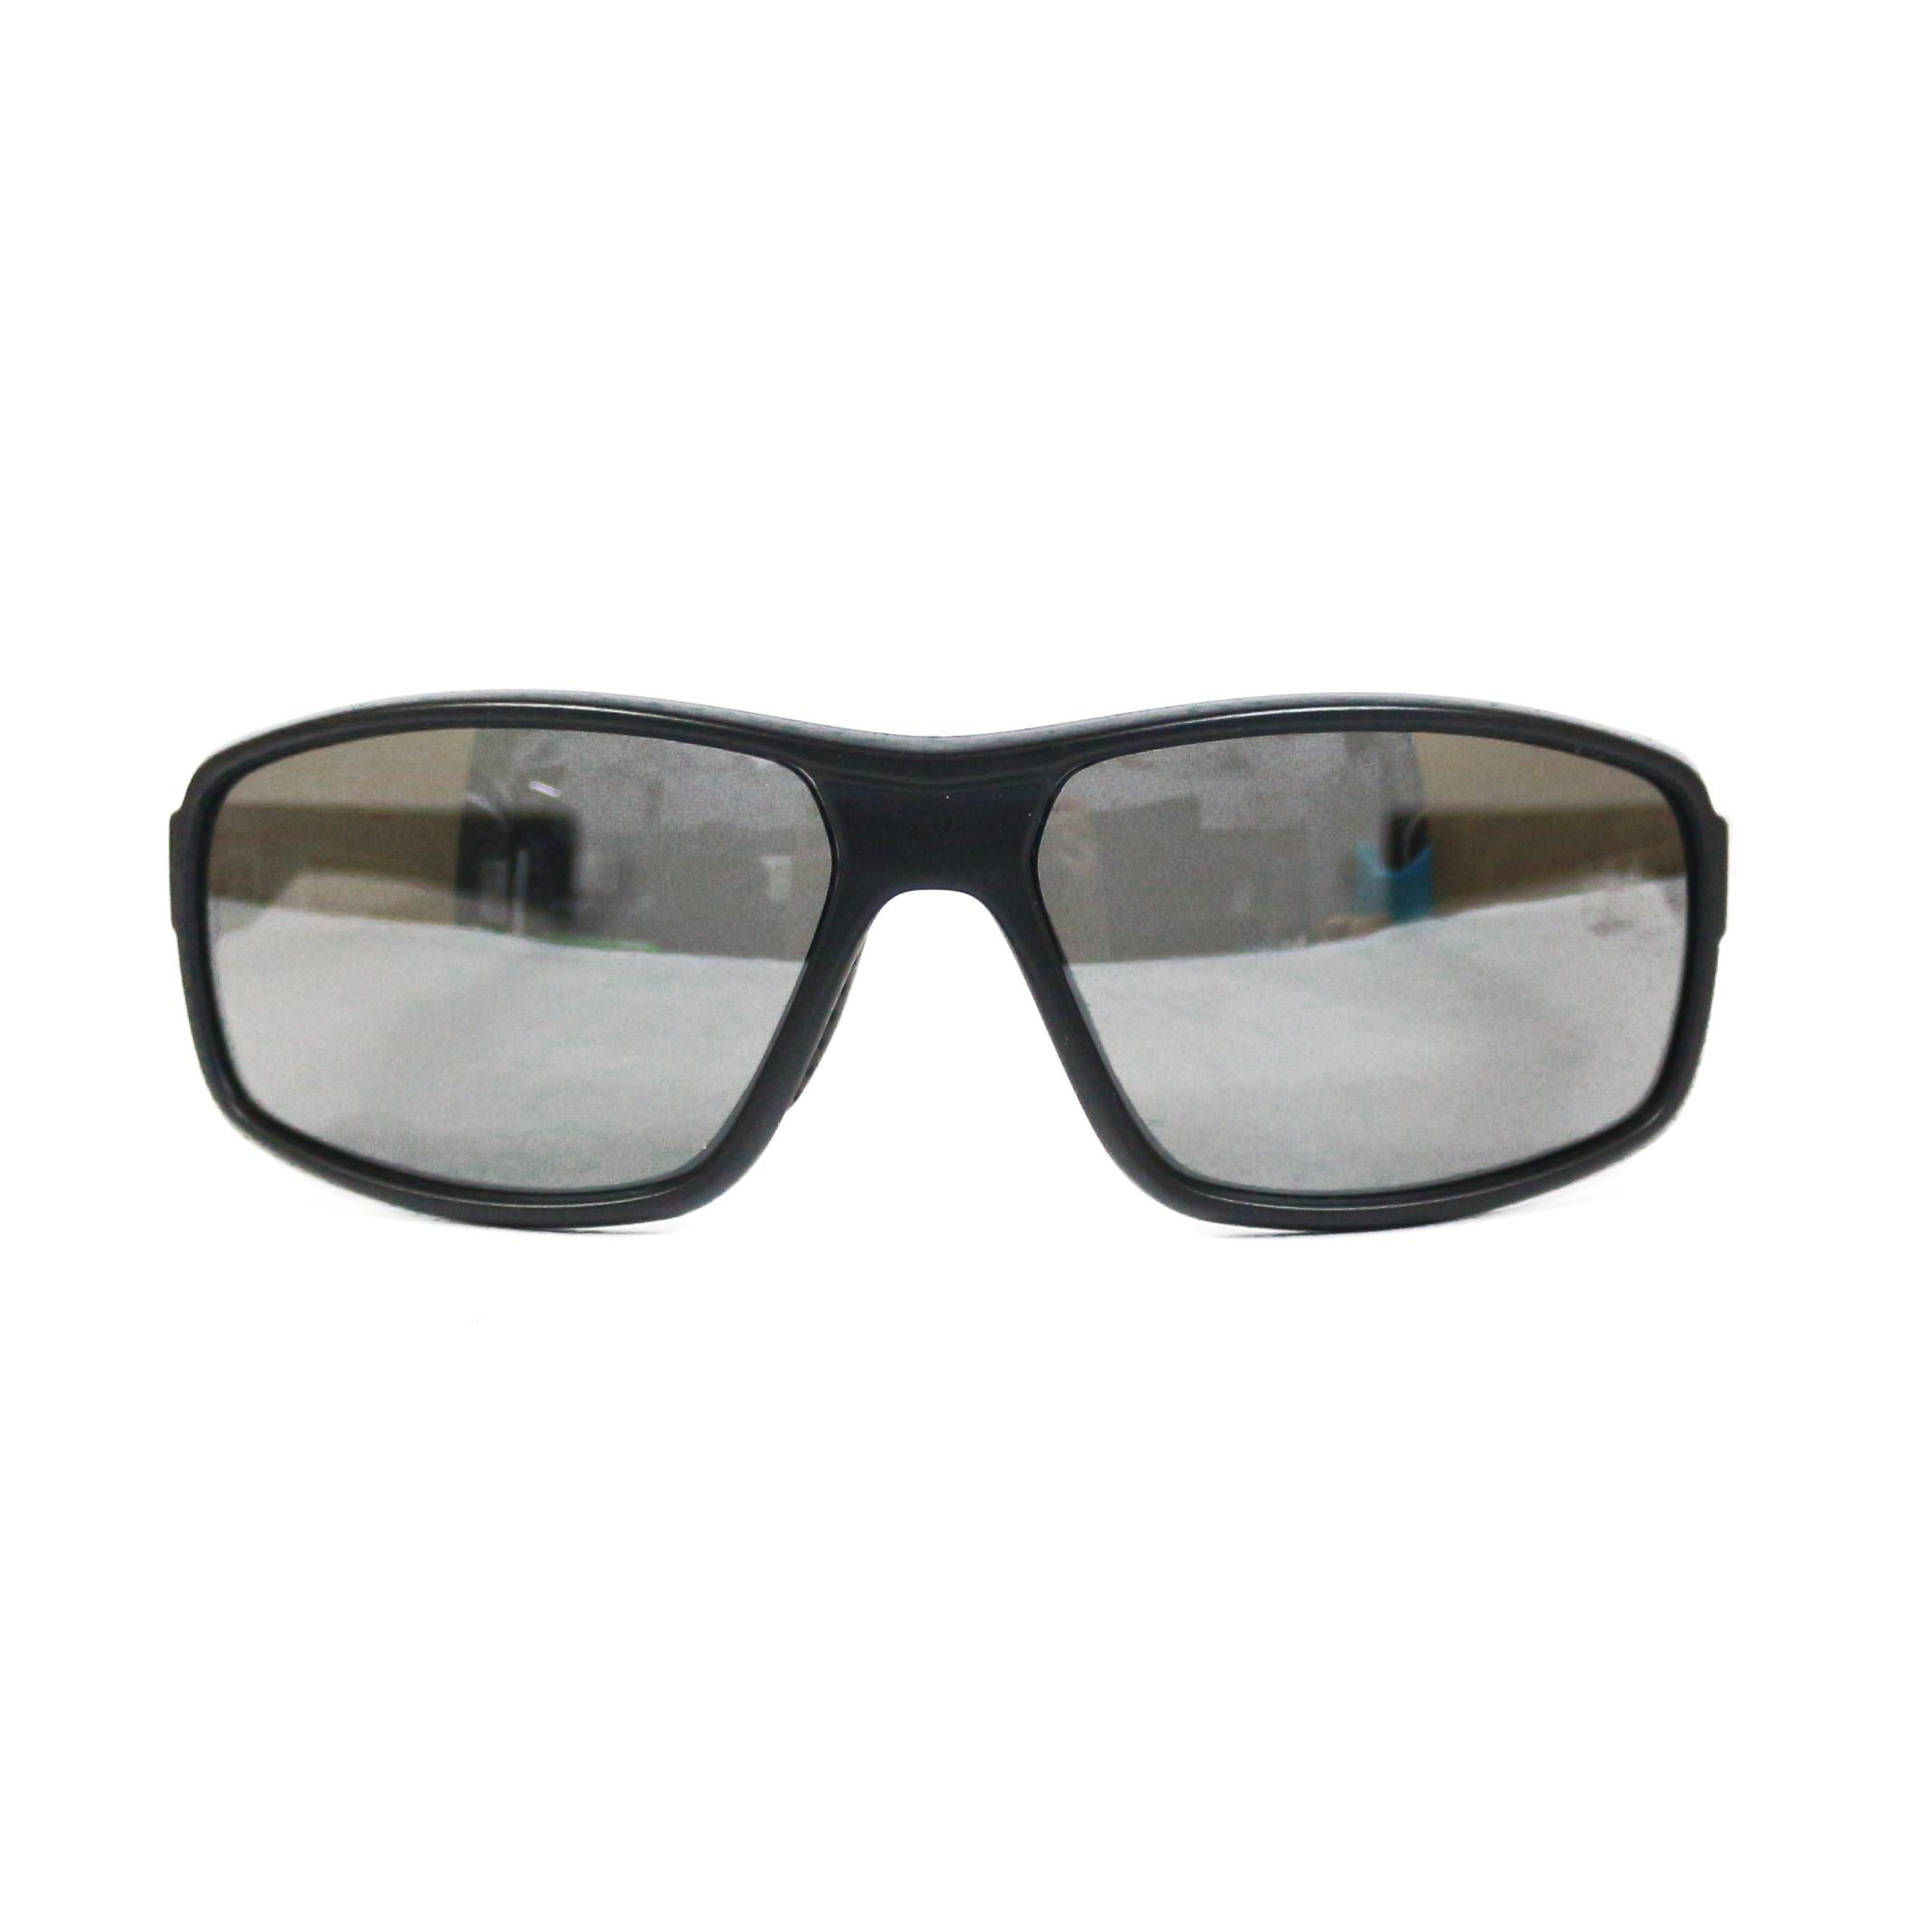 Zeal Polarised Fishing Sunglasses Bunny Walk BW-0201M Blk /Real Tree (1188)